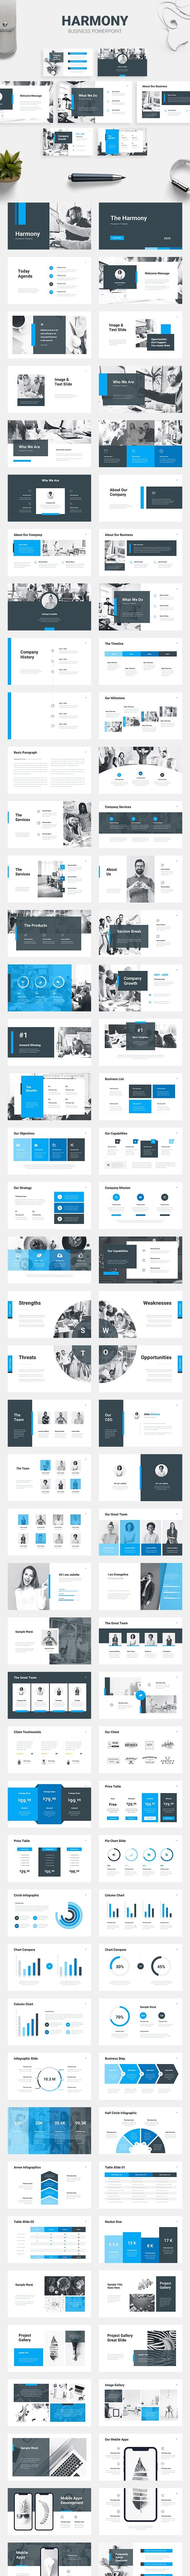 Harmony - Business Presentation - PowerPoint Templates Presentation Templates